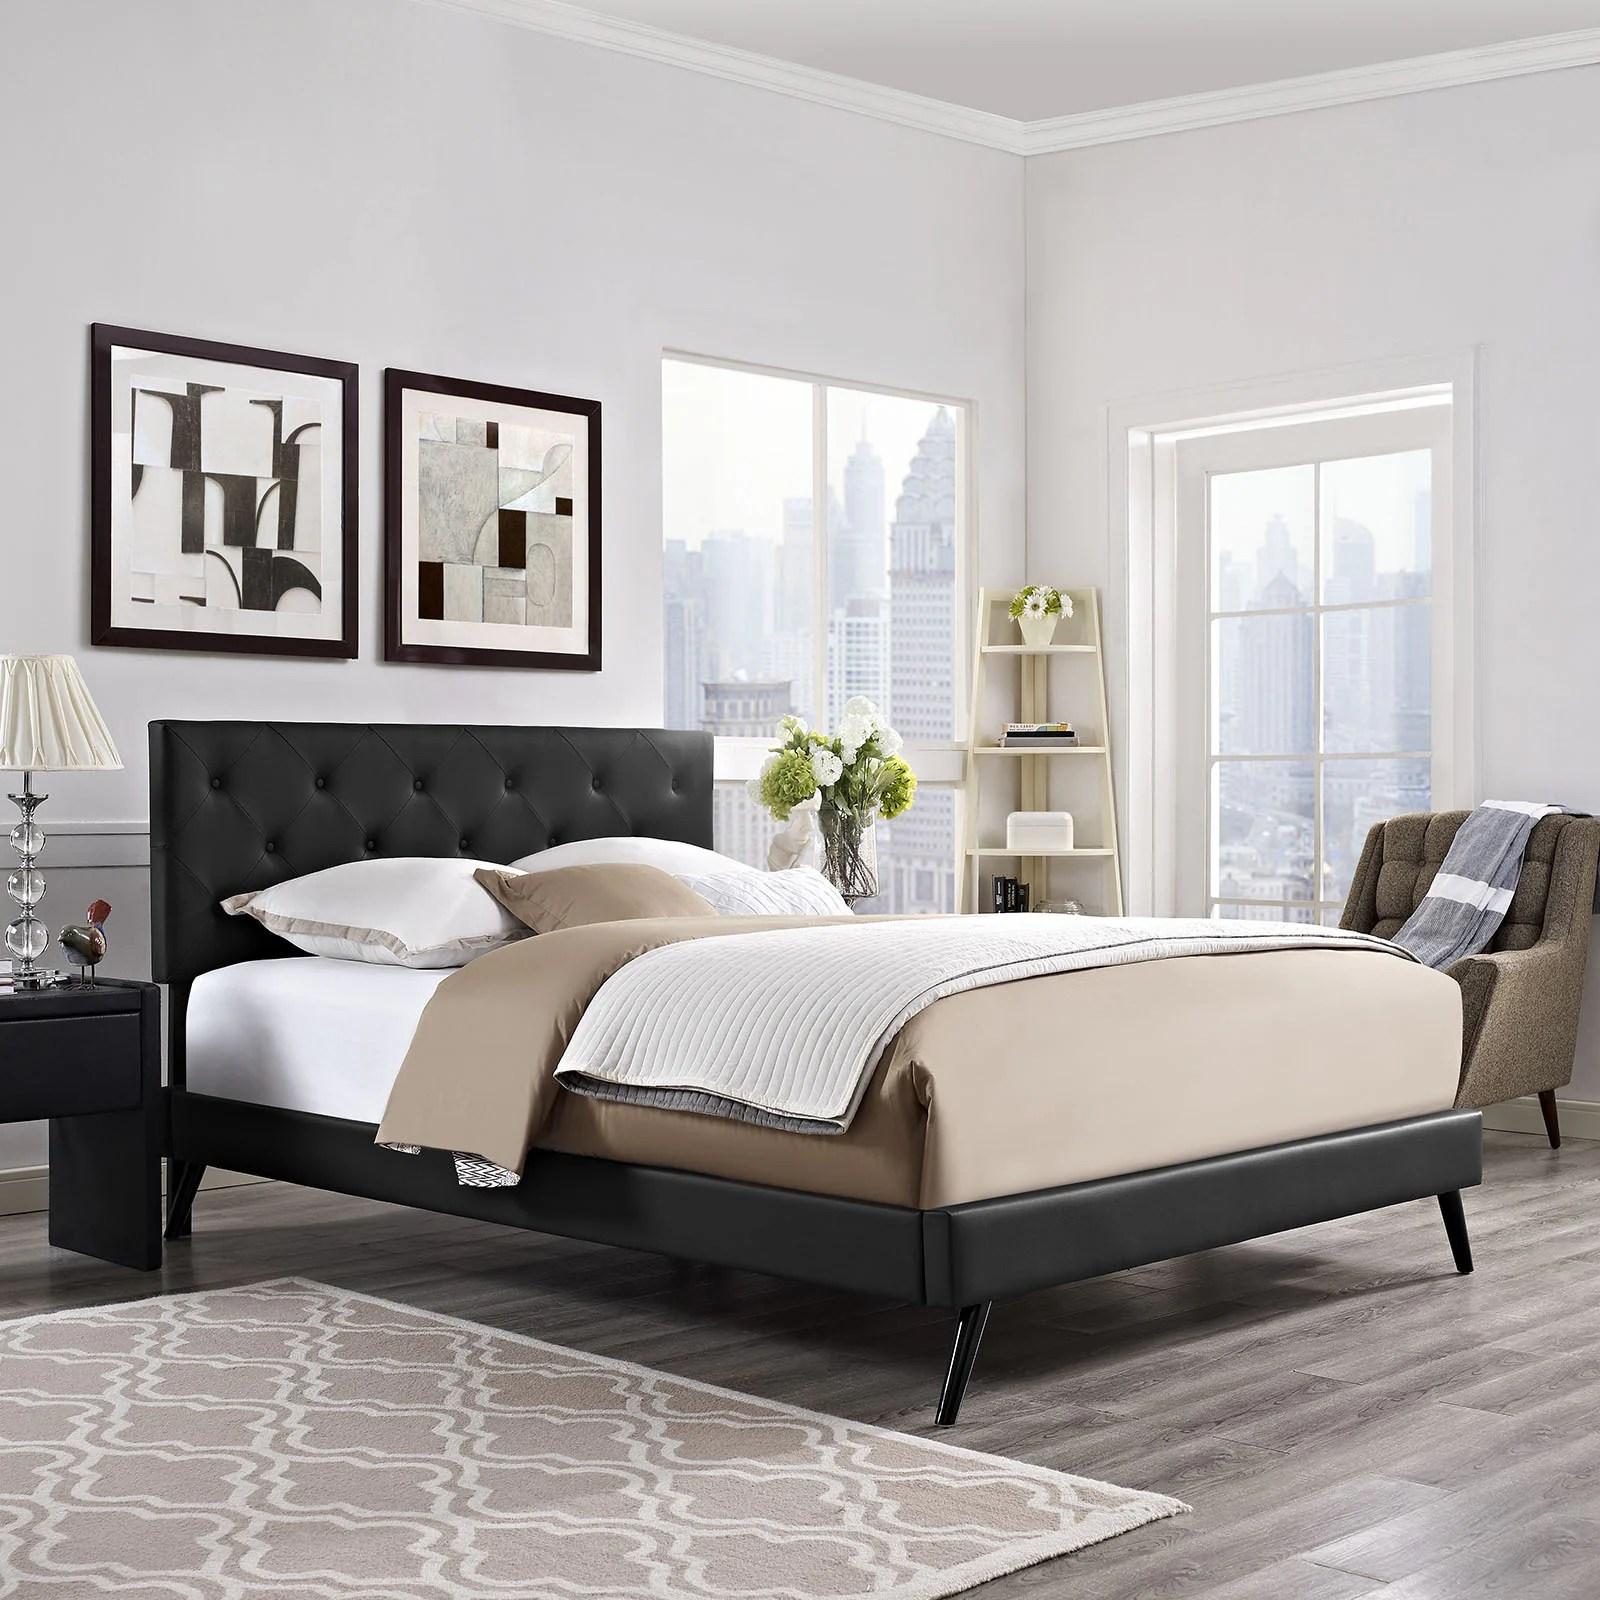 Terisa Black Vinyl Platform Bed with Round Splayed Legs